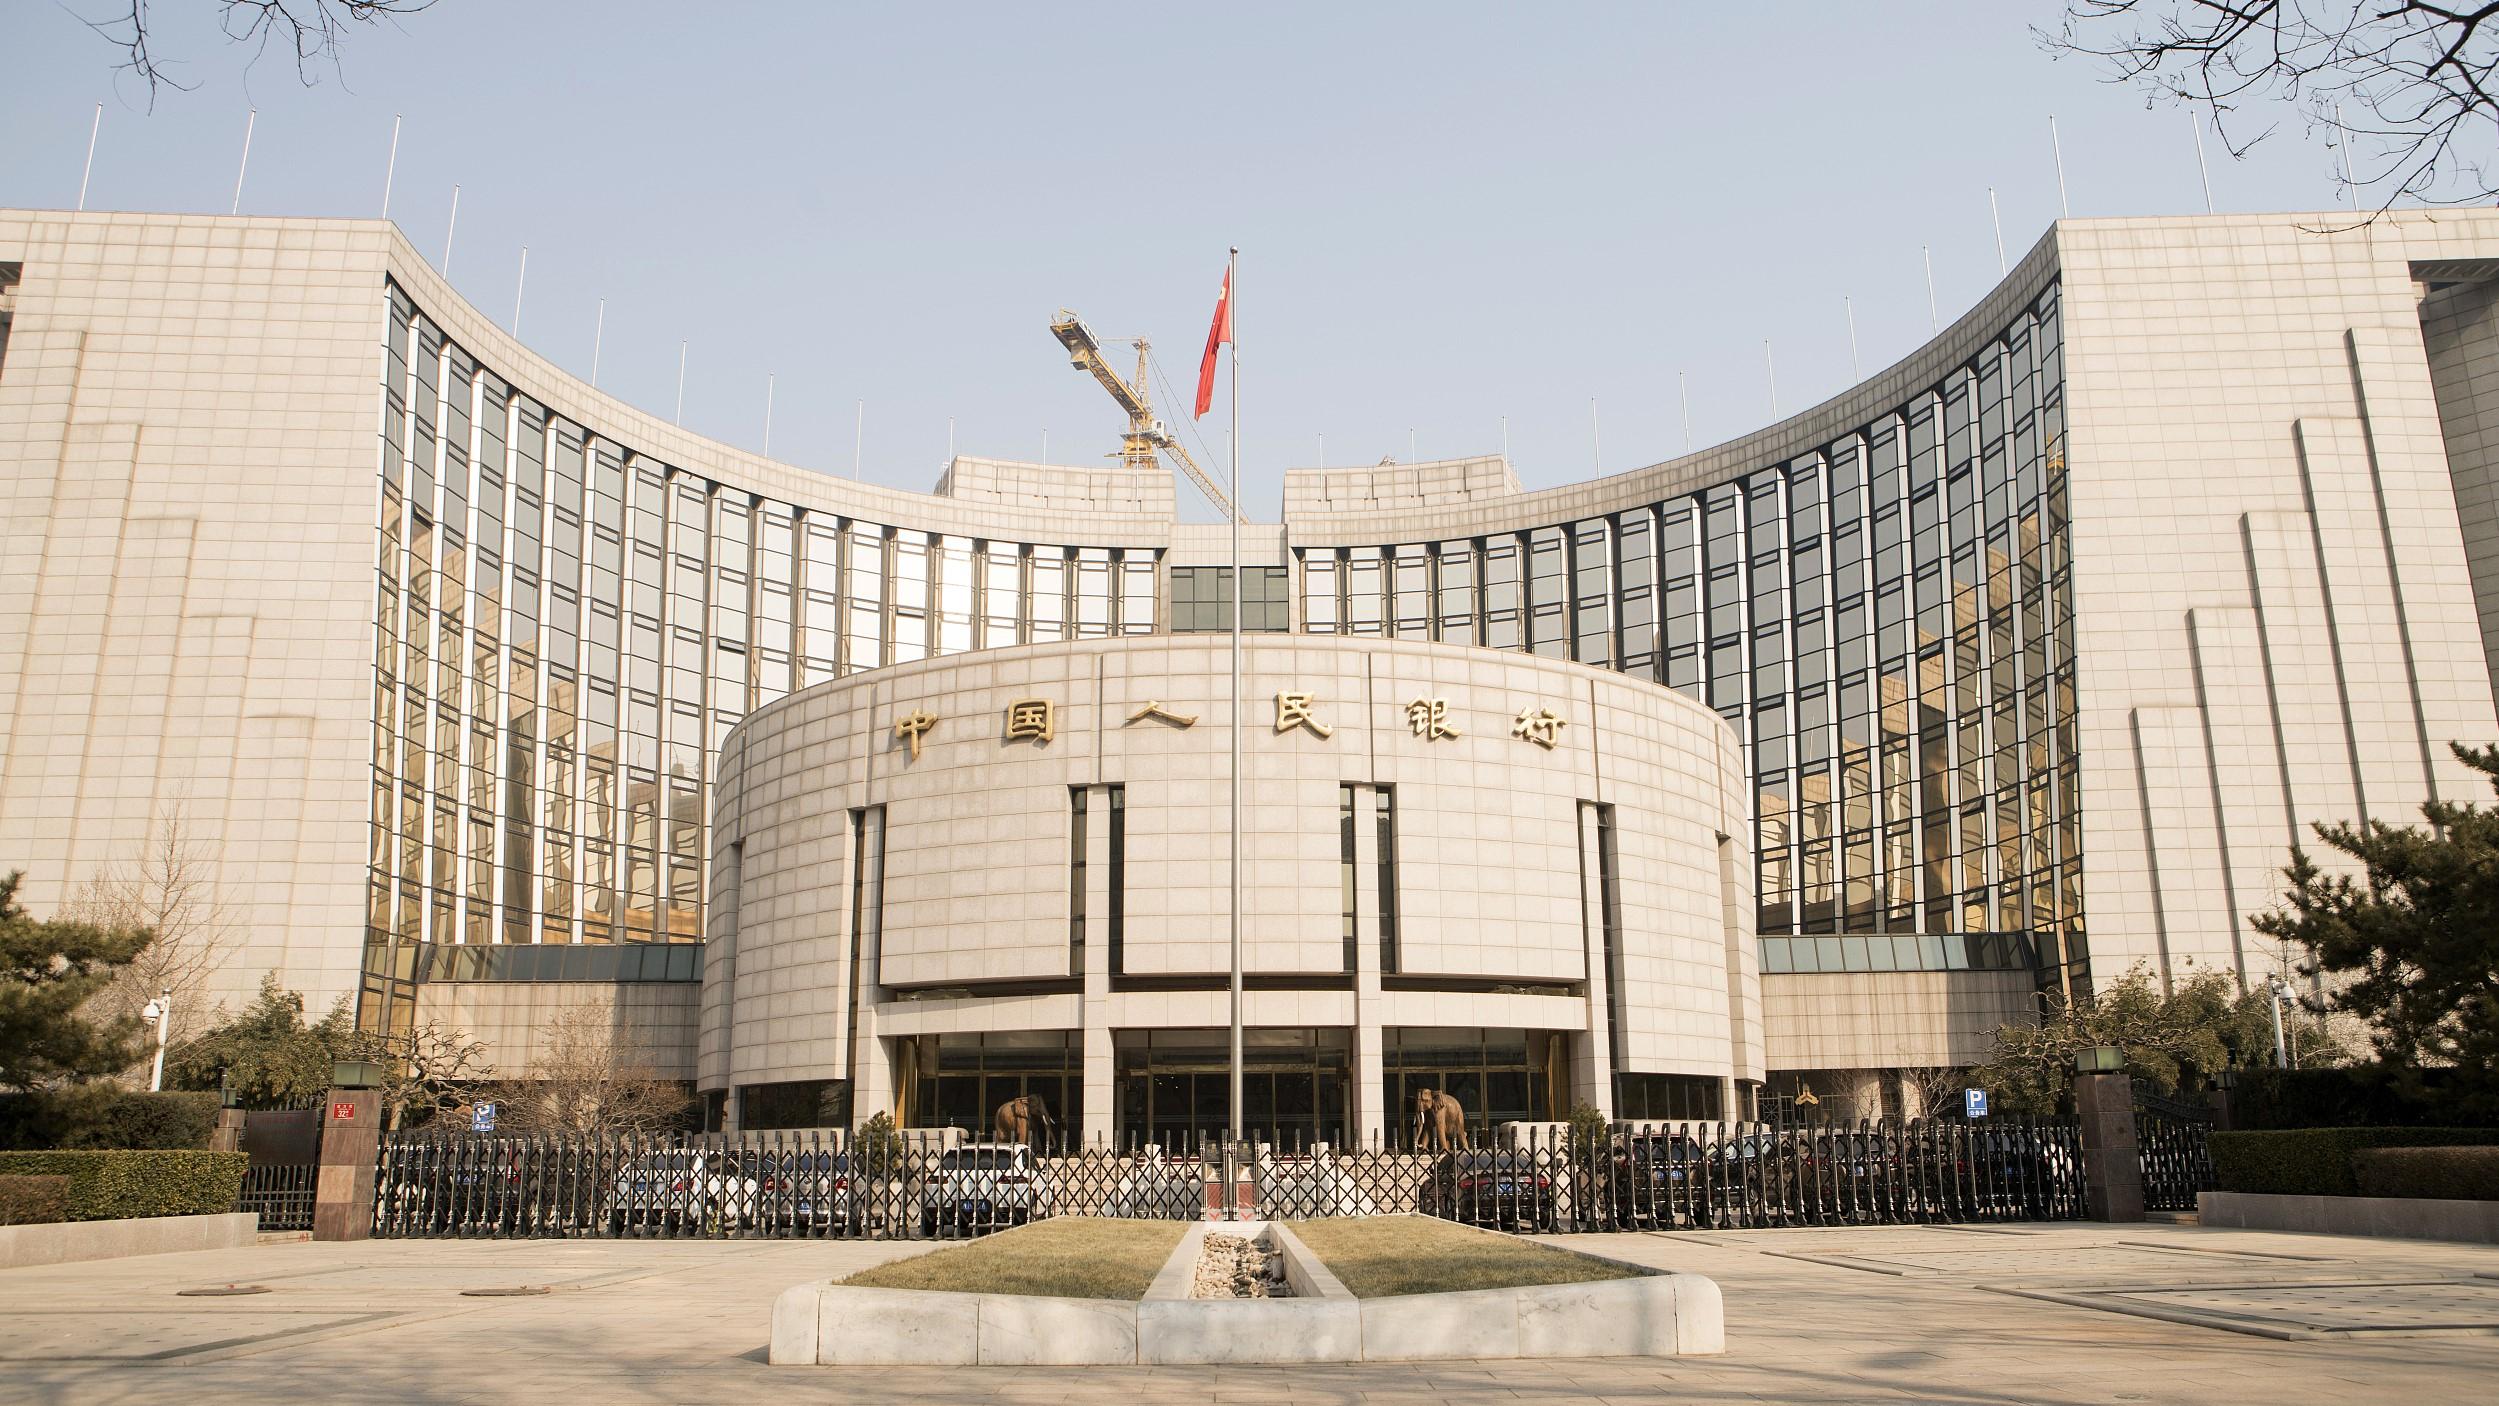 cin merkez bankasi yetkilisi dijital yuan hakkinda konustu